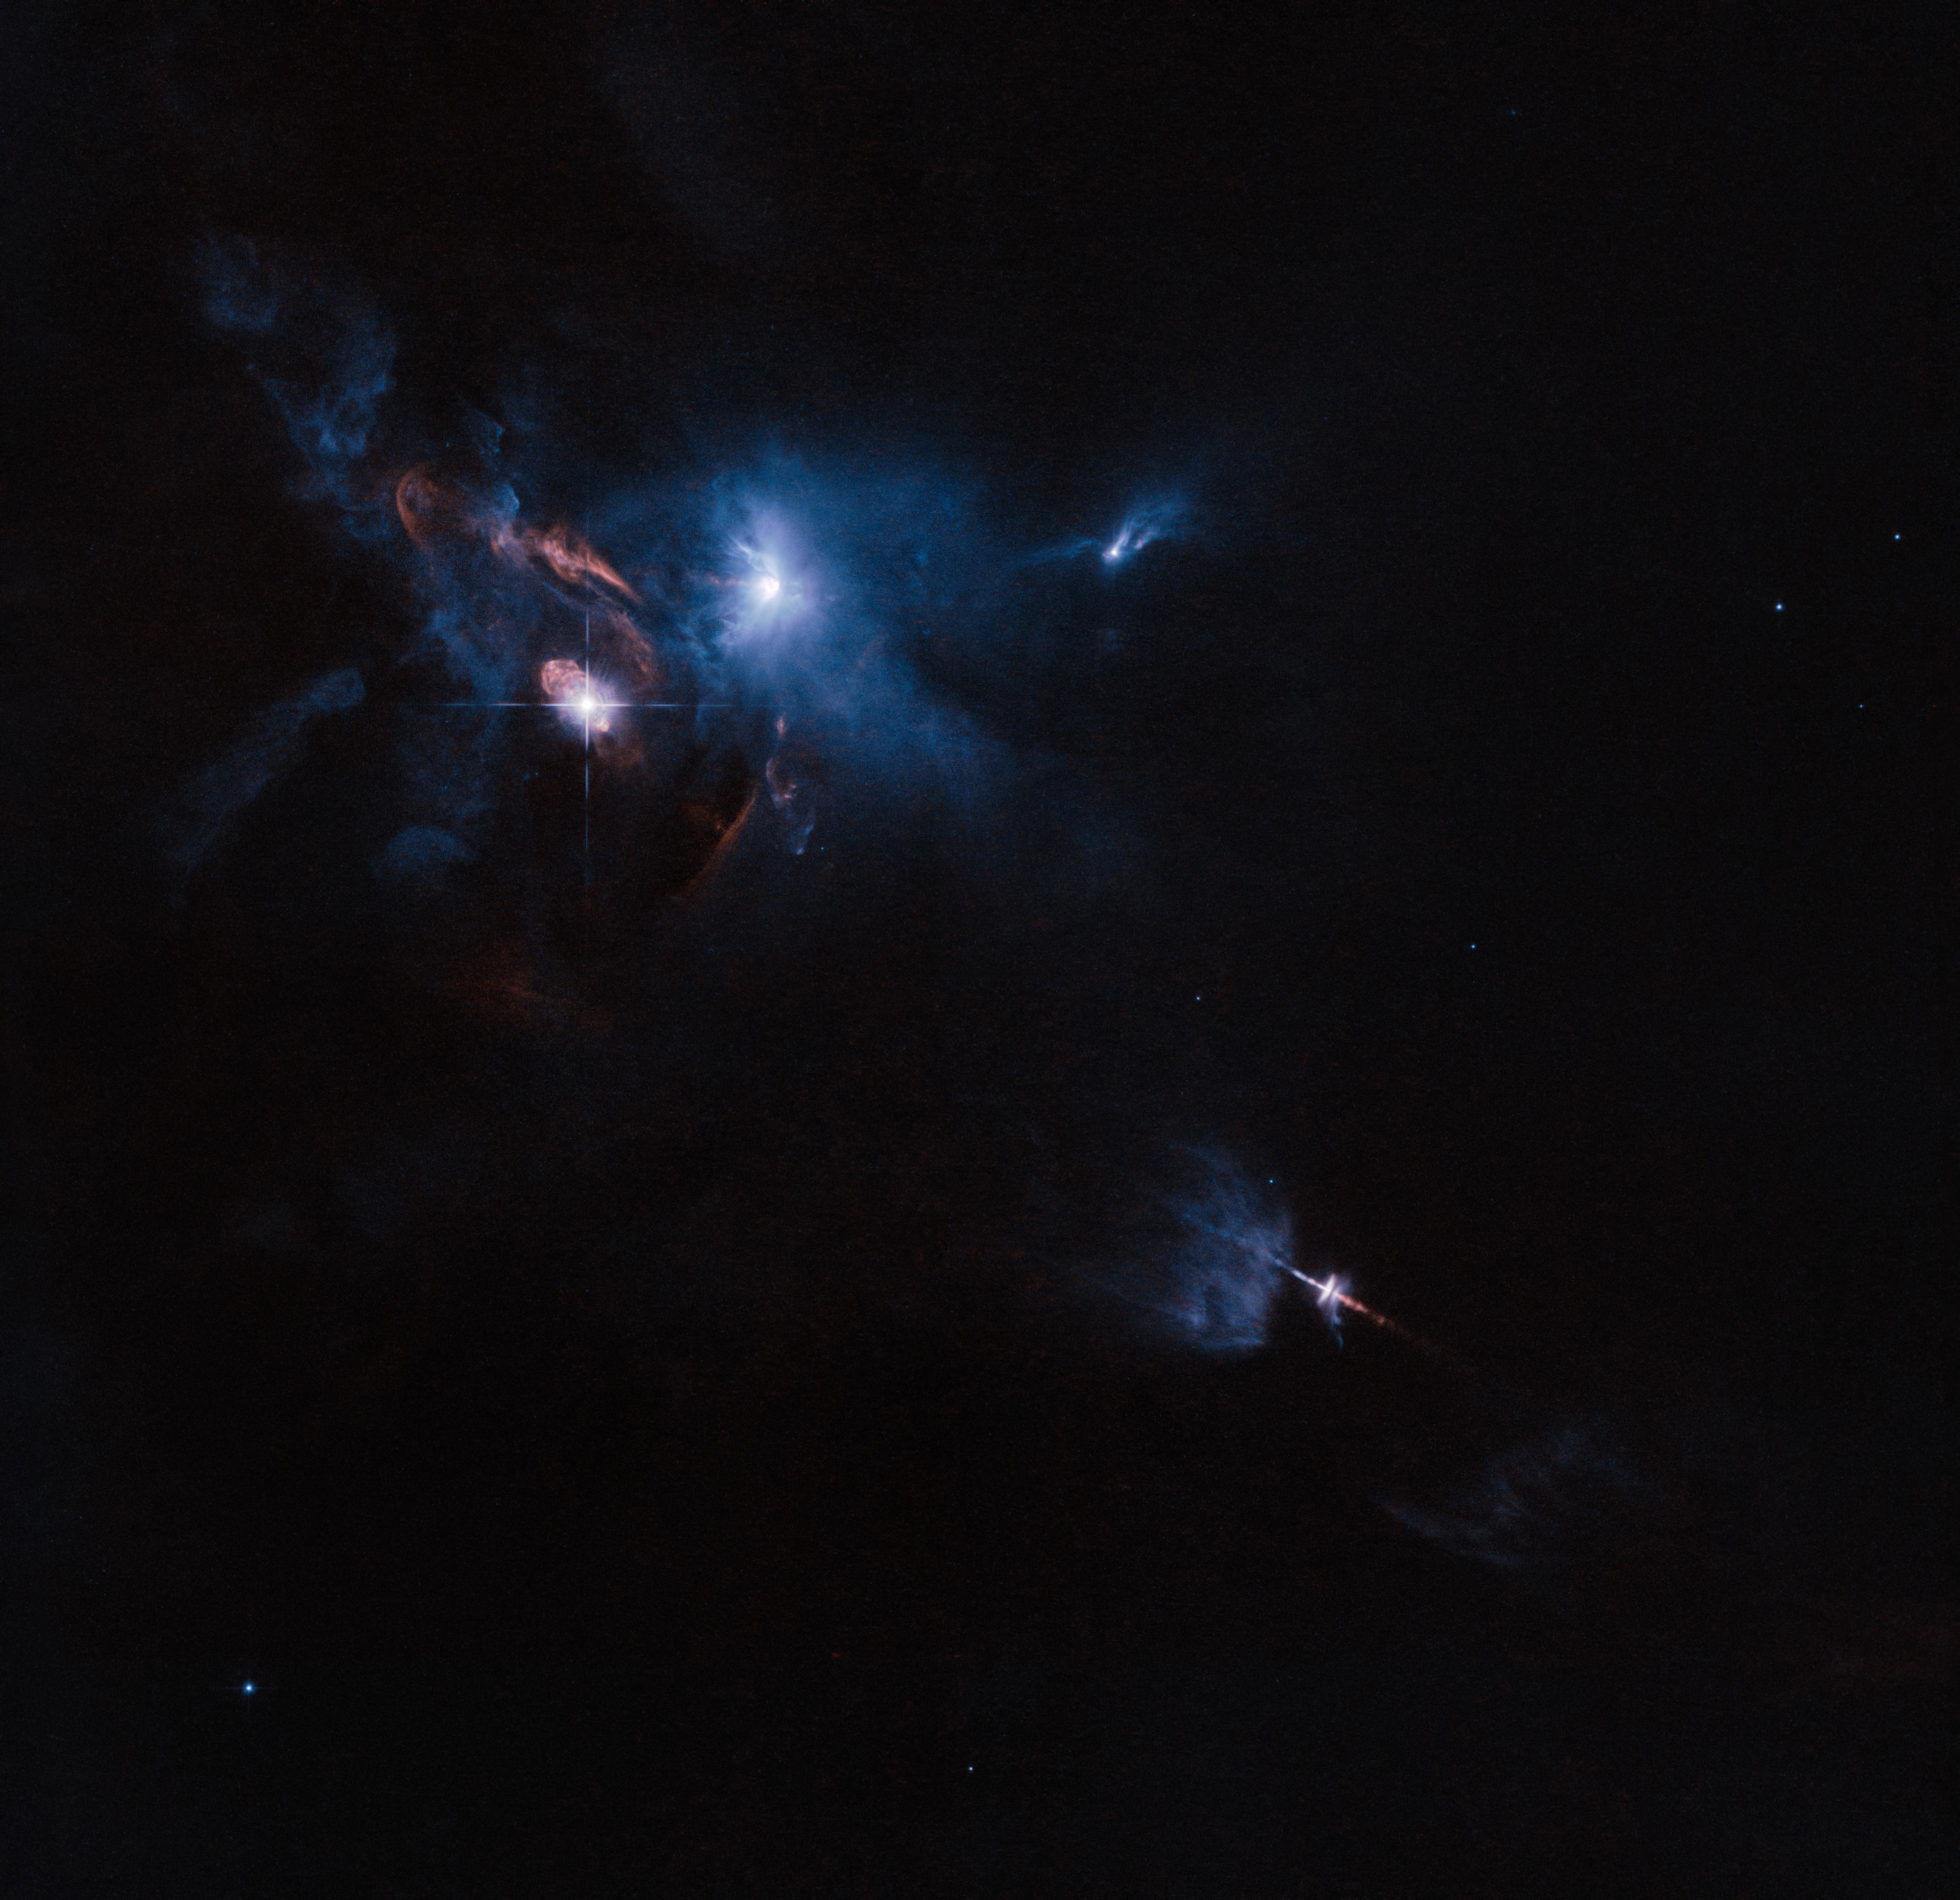 HUBBLE'S TOP 100 • #96 • Credit: ESA/Hubble & NASA